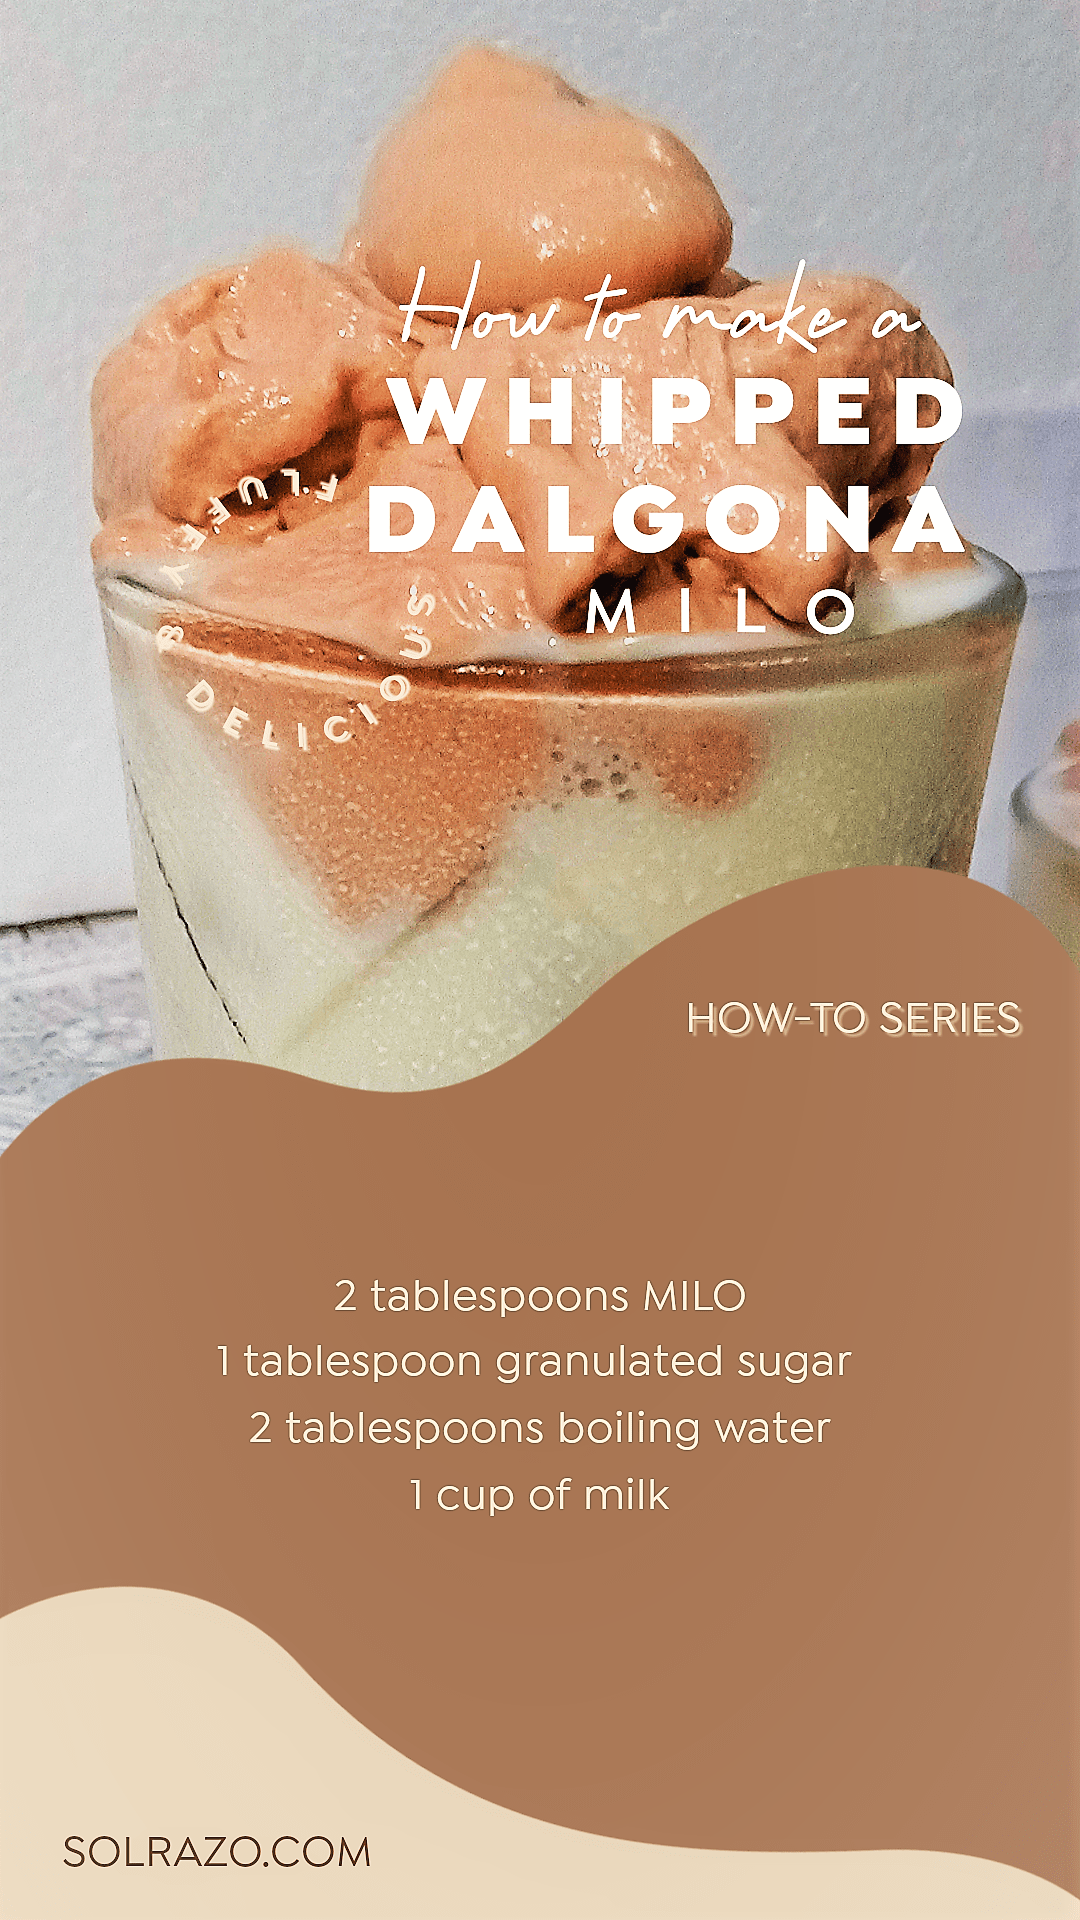 How To Make Dalgona Milo Sol Razo Recipe Milo Recipe Easy Drink Recipes Coffee Ingredients